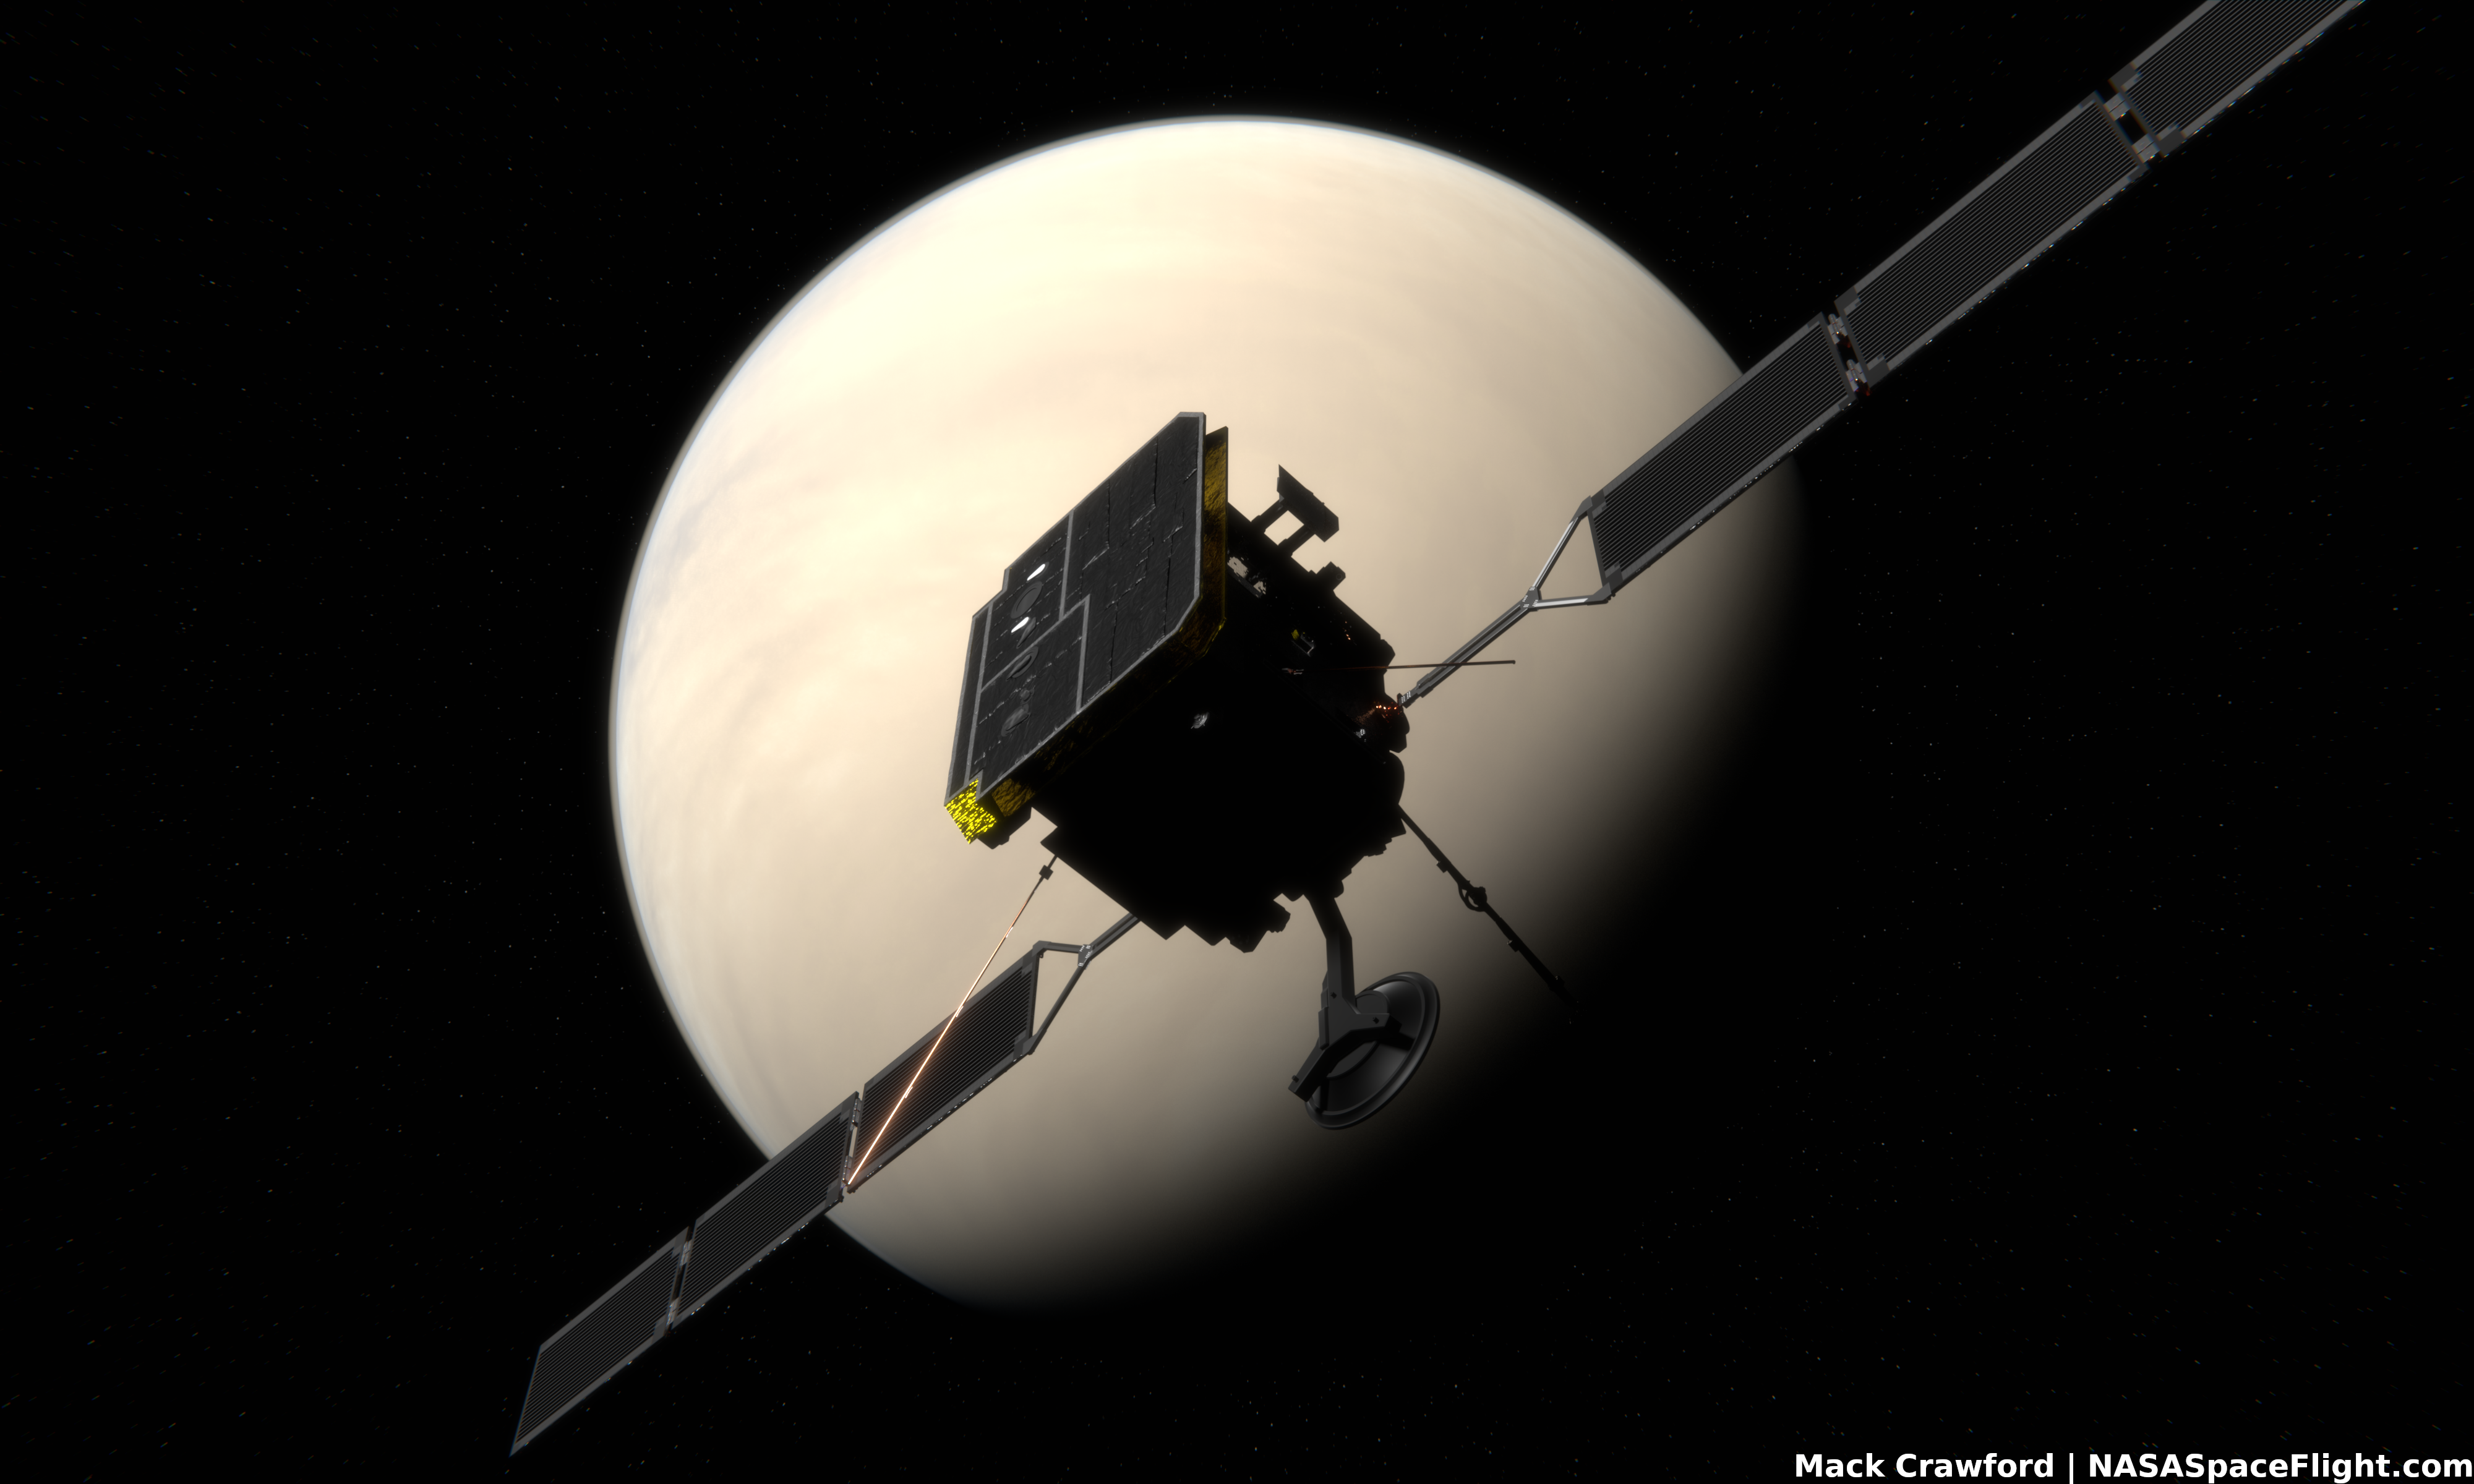 ESA's Solar Orbiter ready to study the Sun, heading for Florida